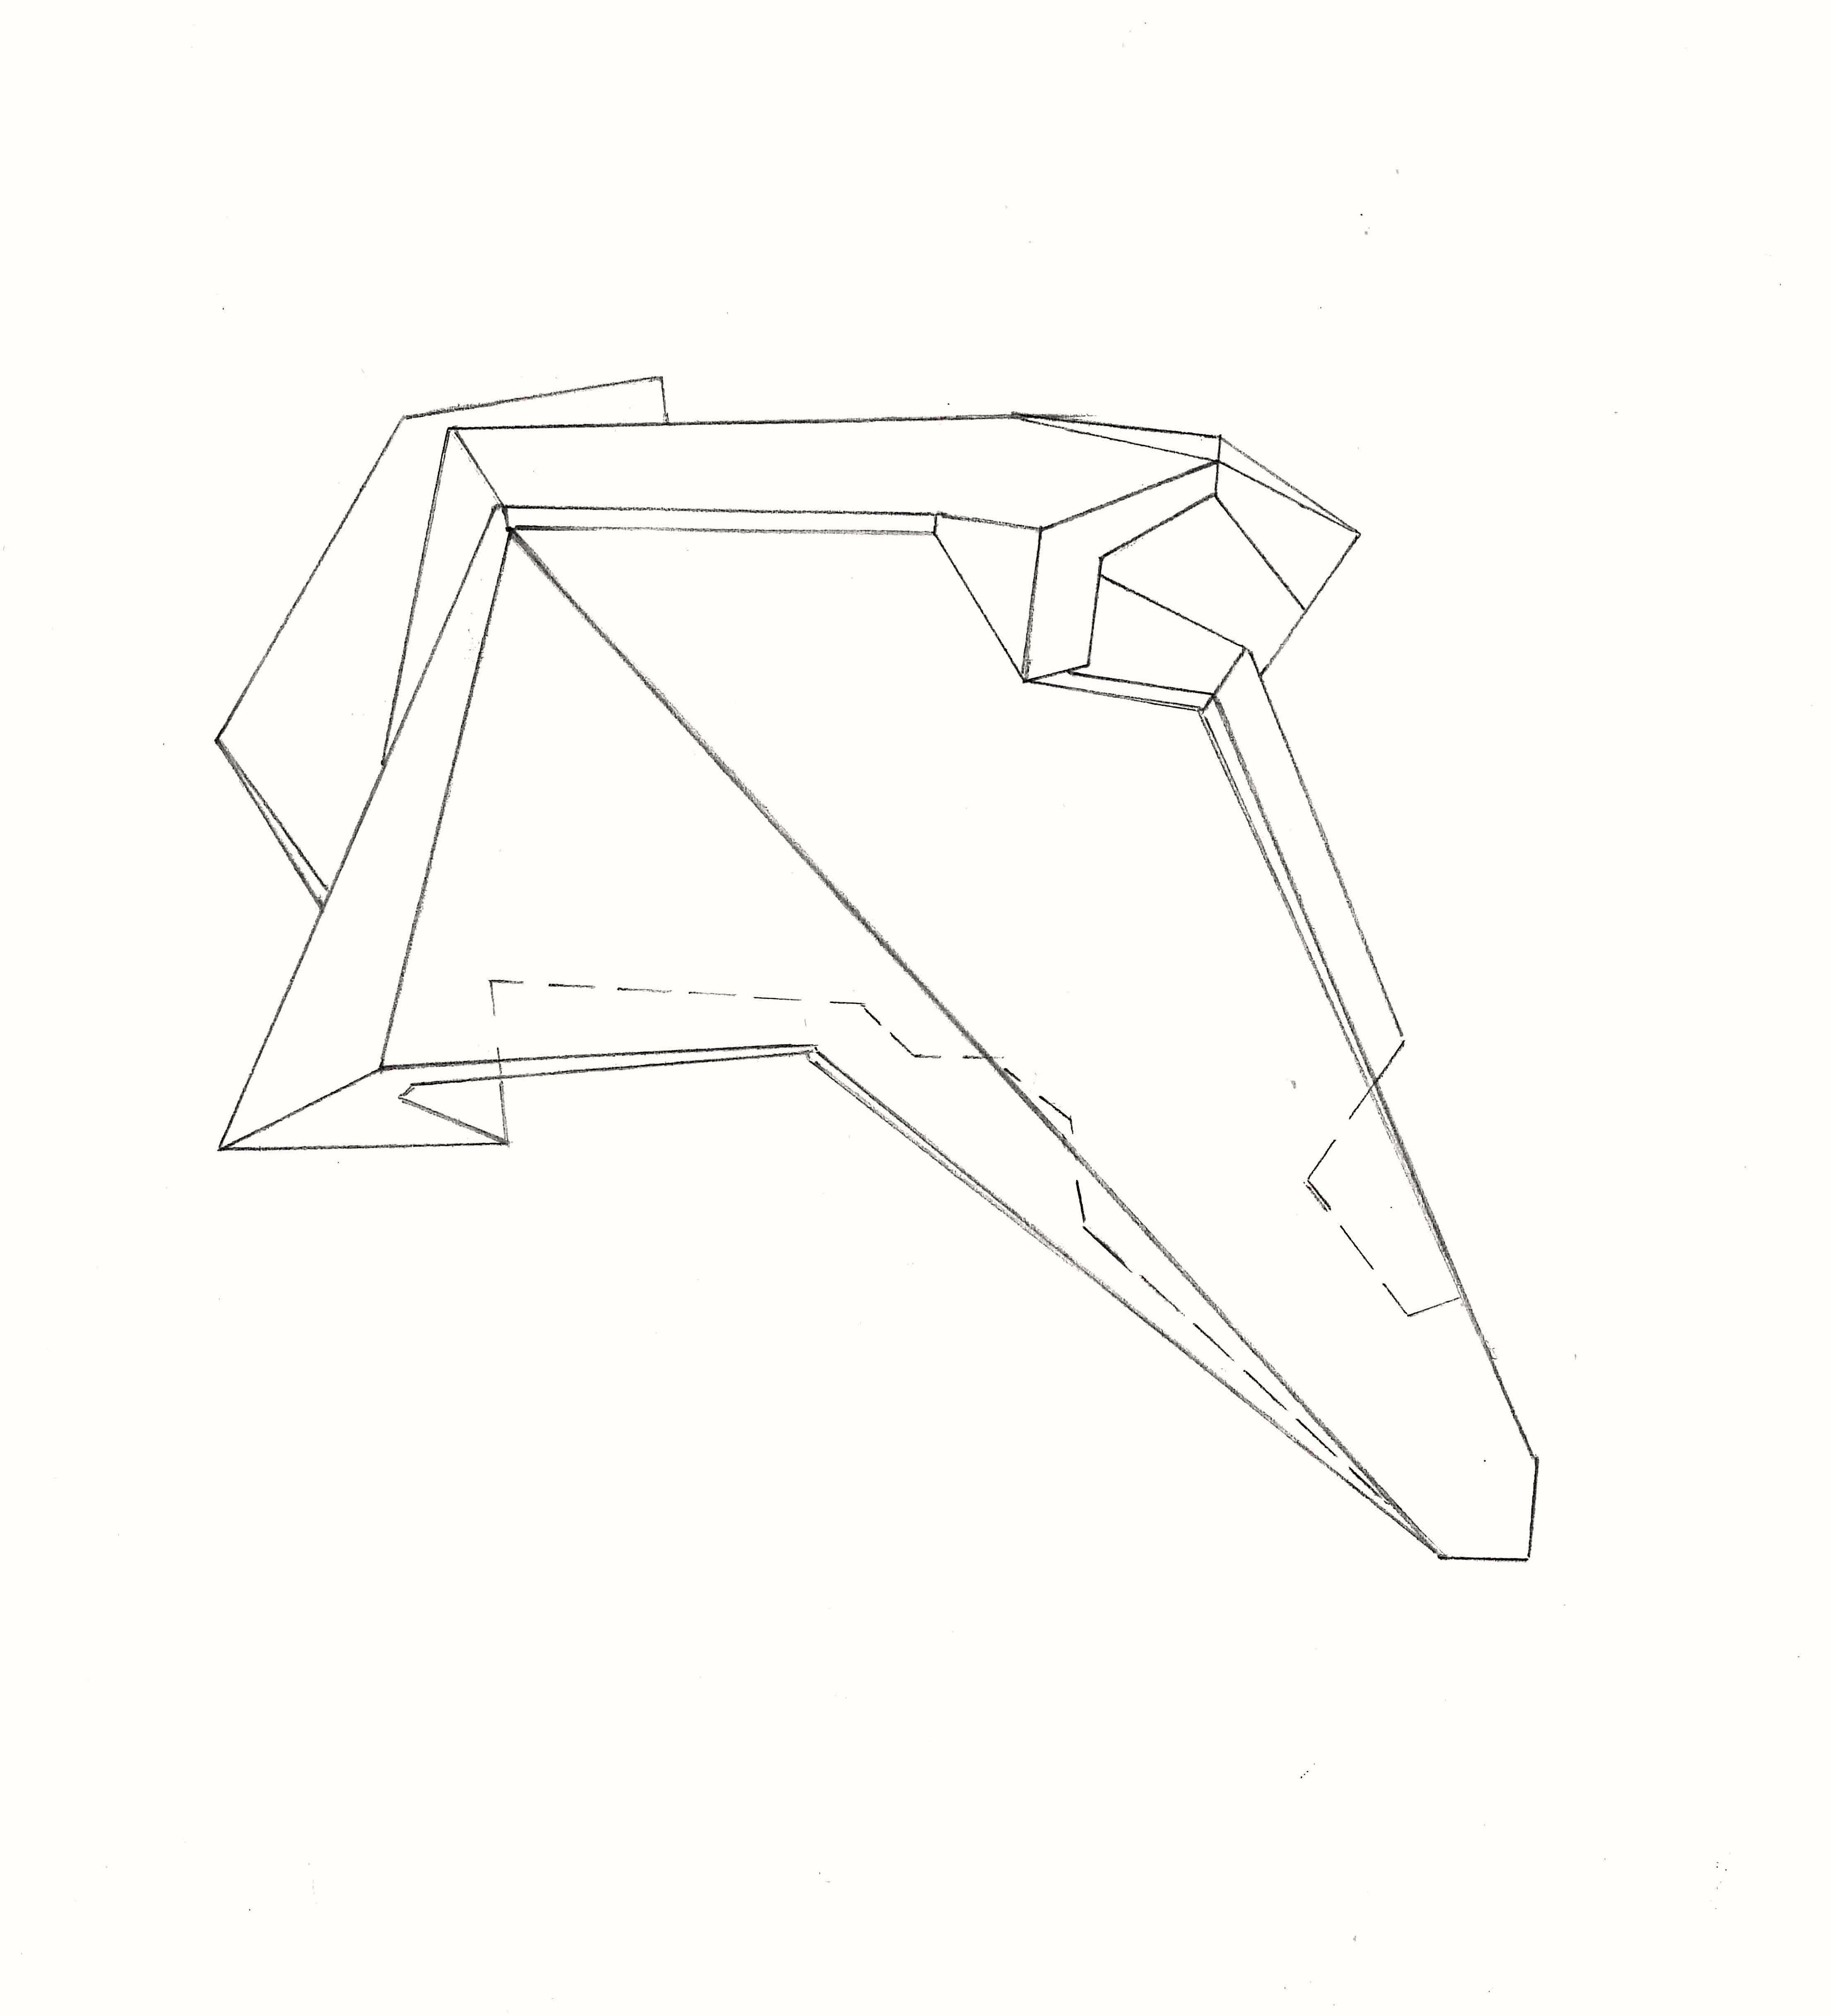 Esther Brakenhoff - Objectbenaming Apenrots(tekening)